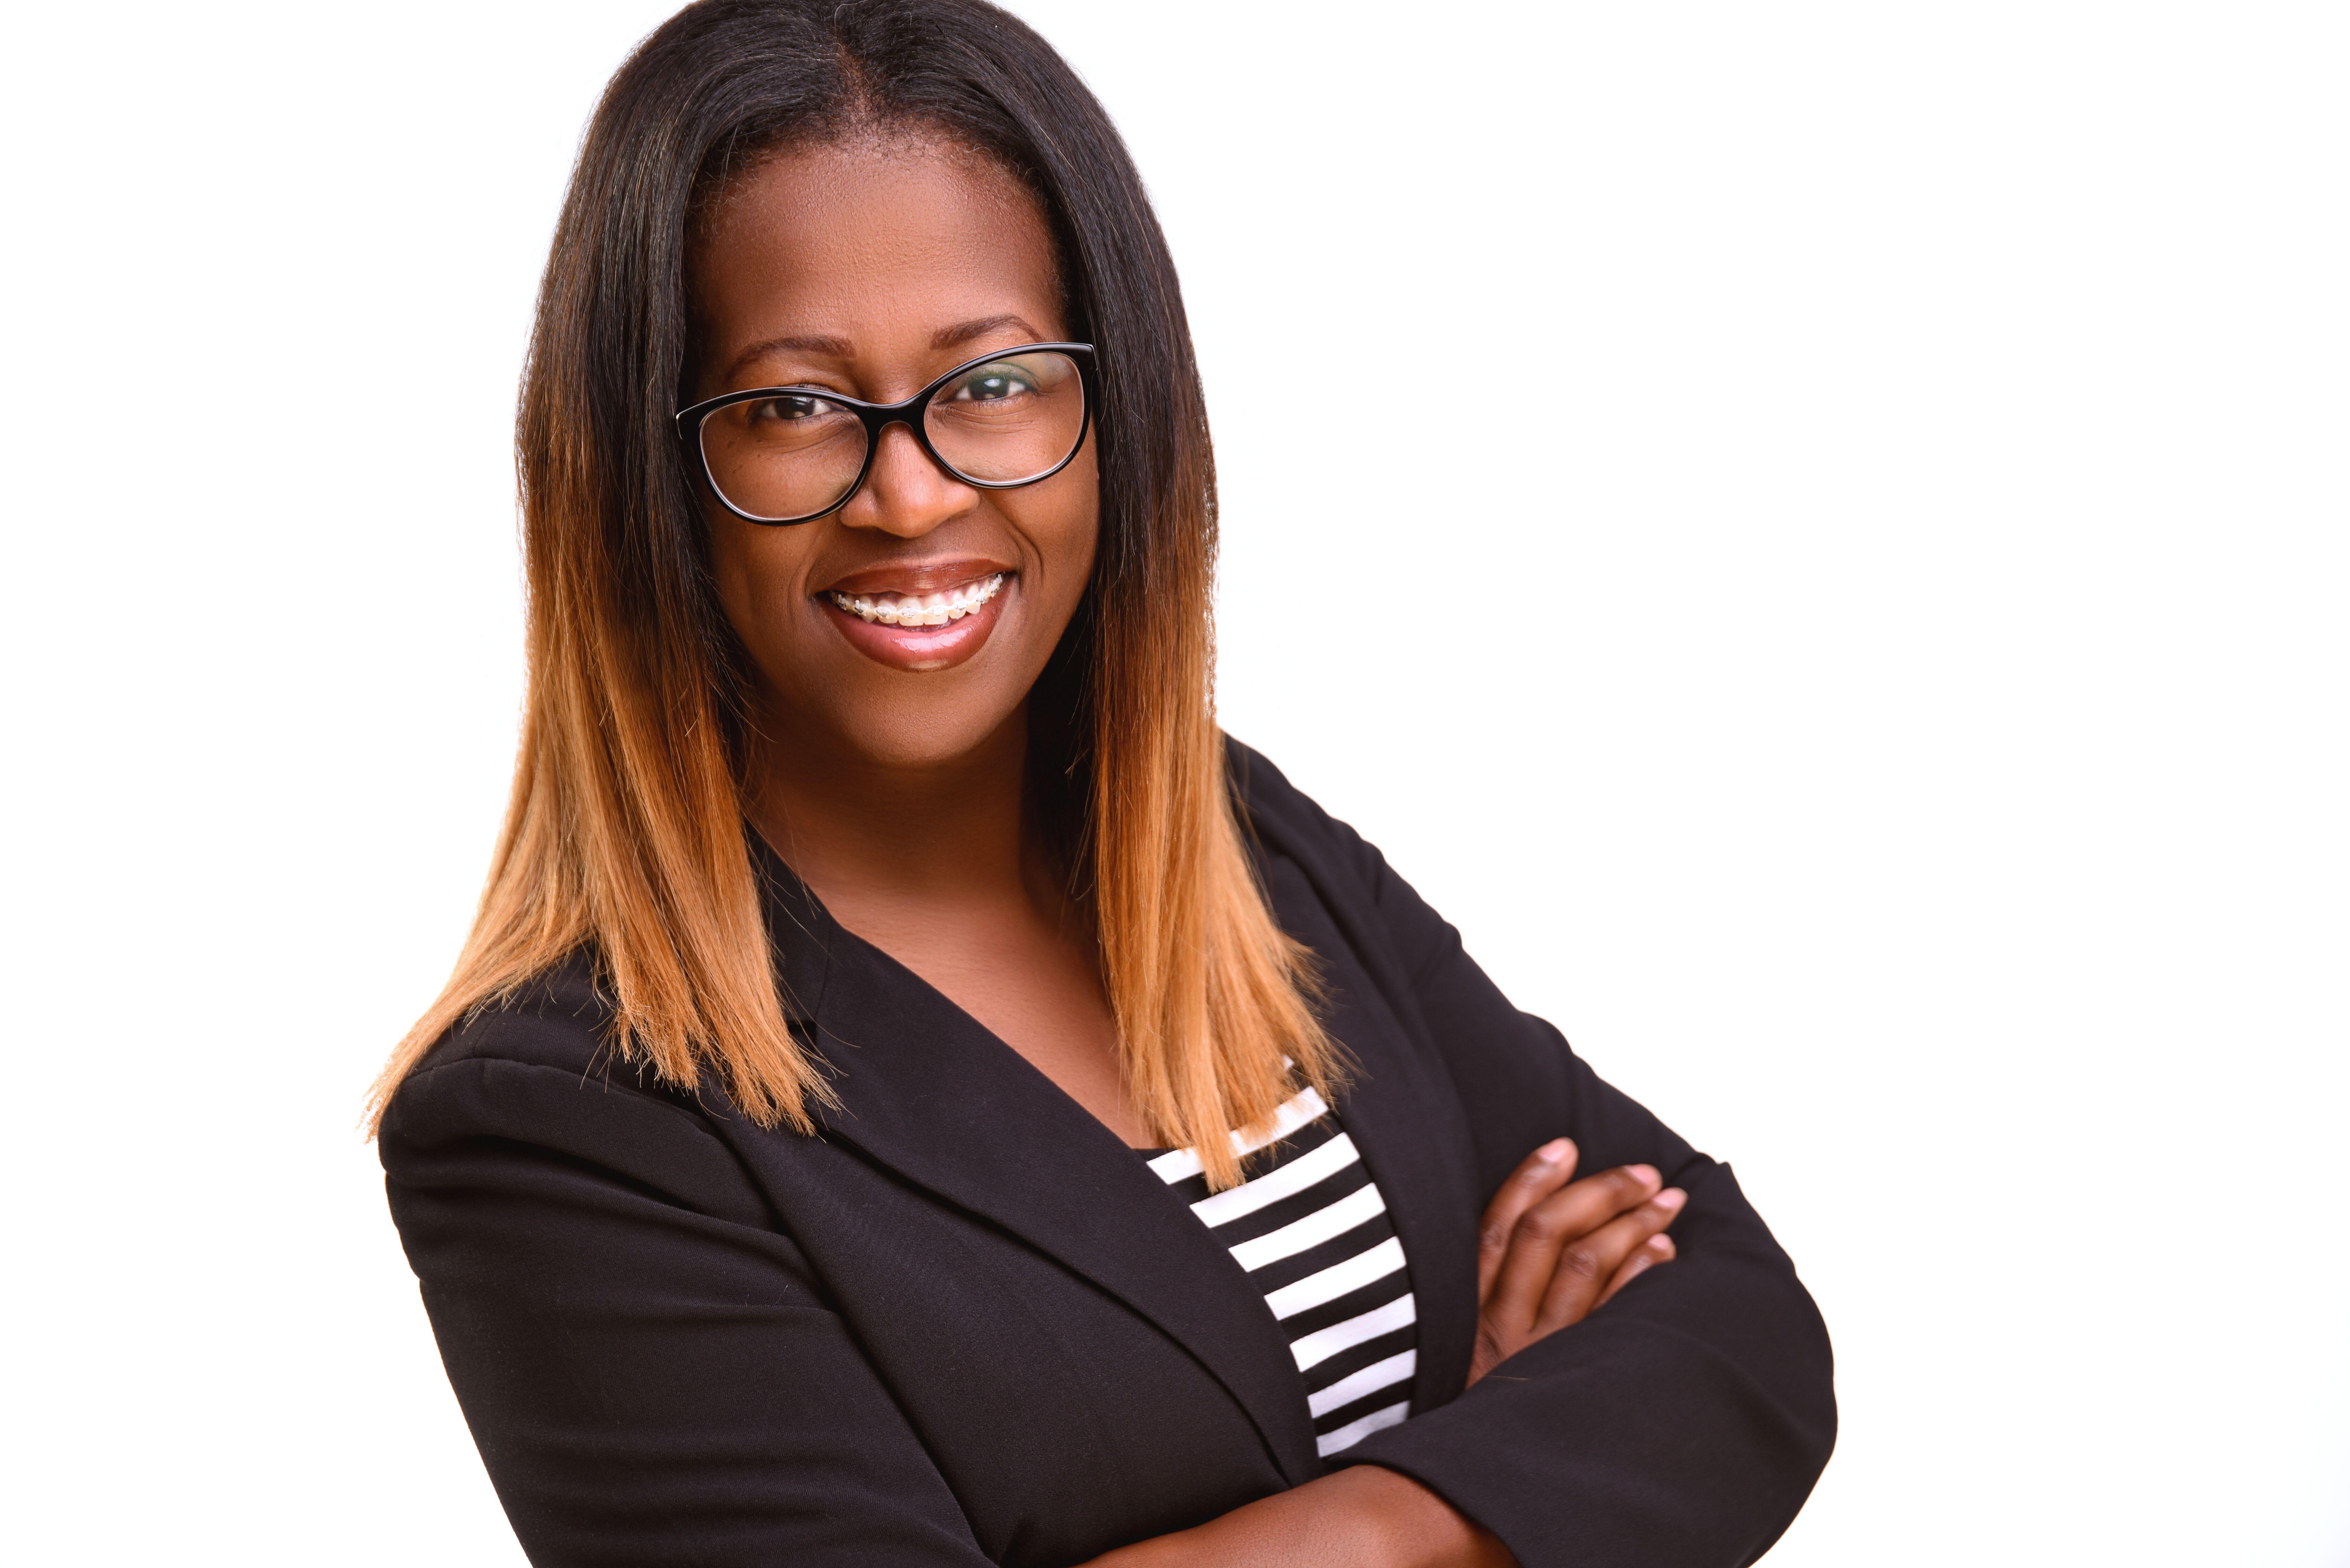 Dr. Eunice Tarver